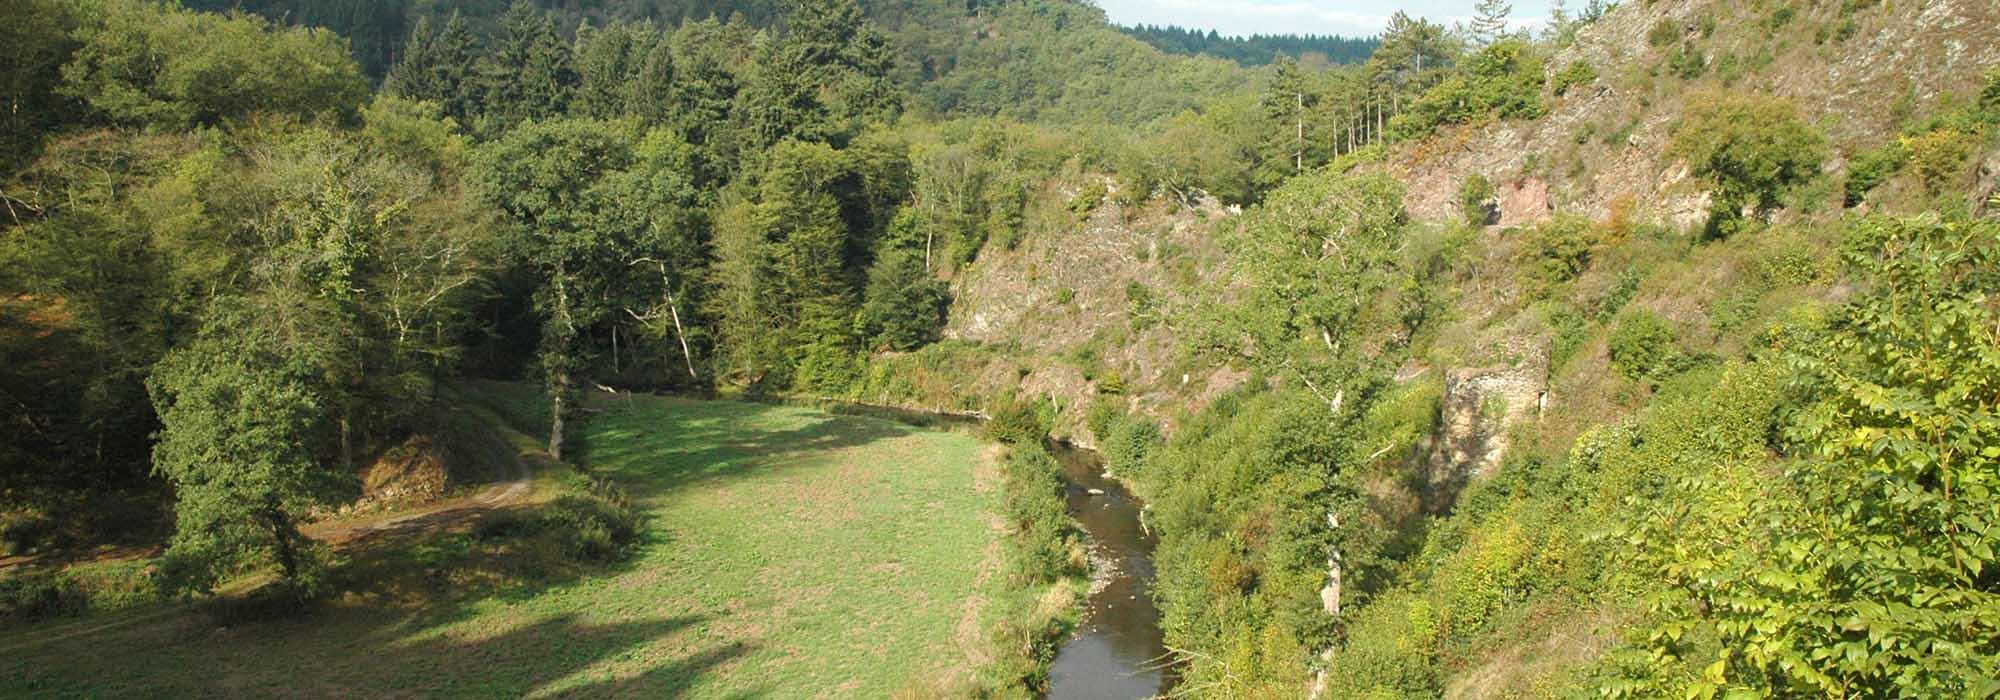 Elzbach-DSC_4952